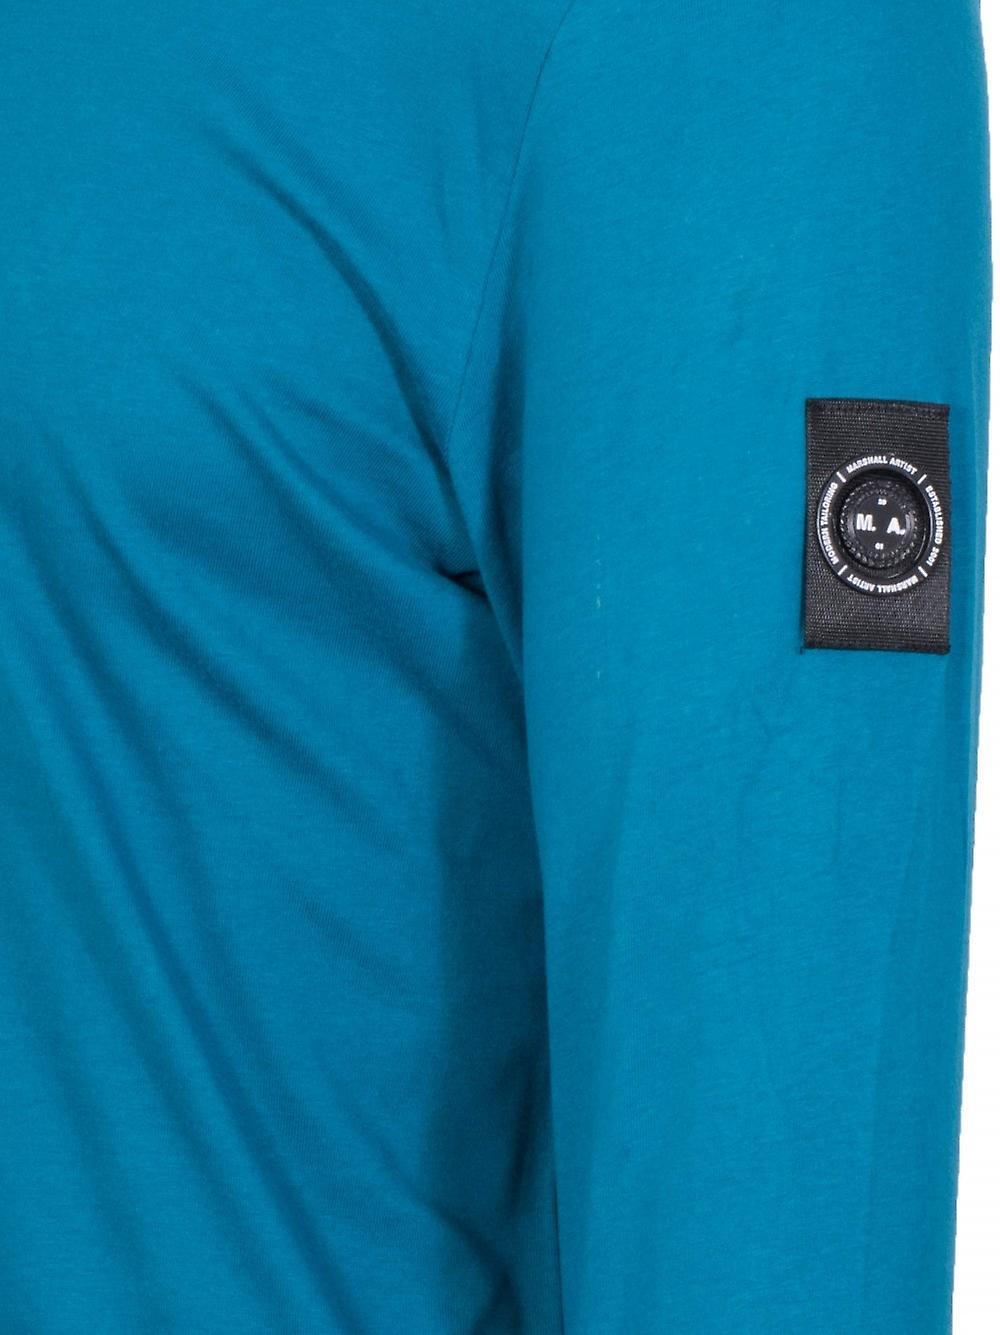 Marshall Artist Teal Garment Dyed T-Shirt